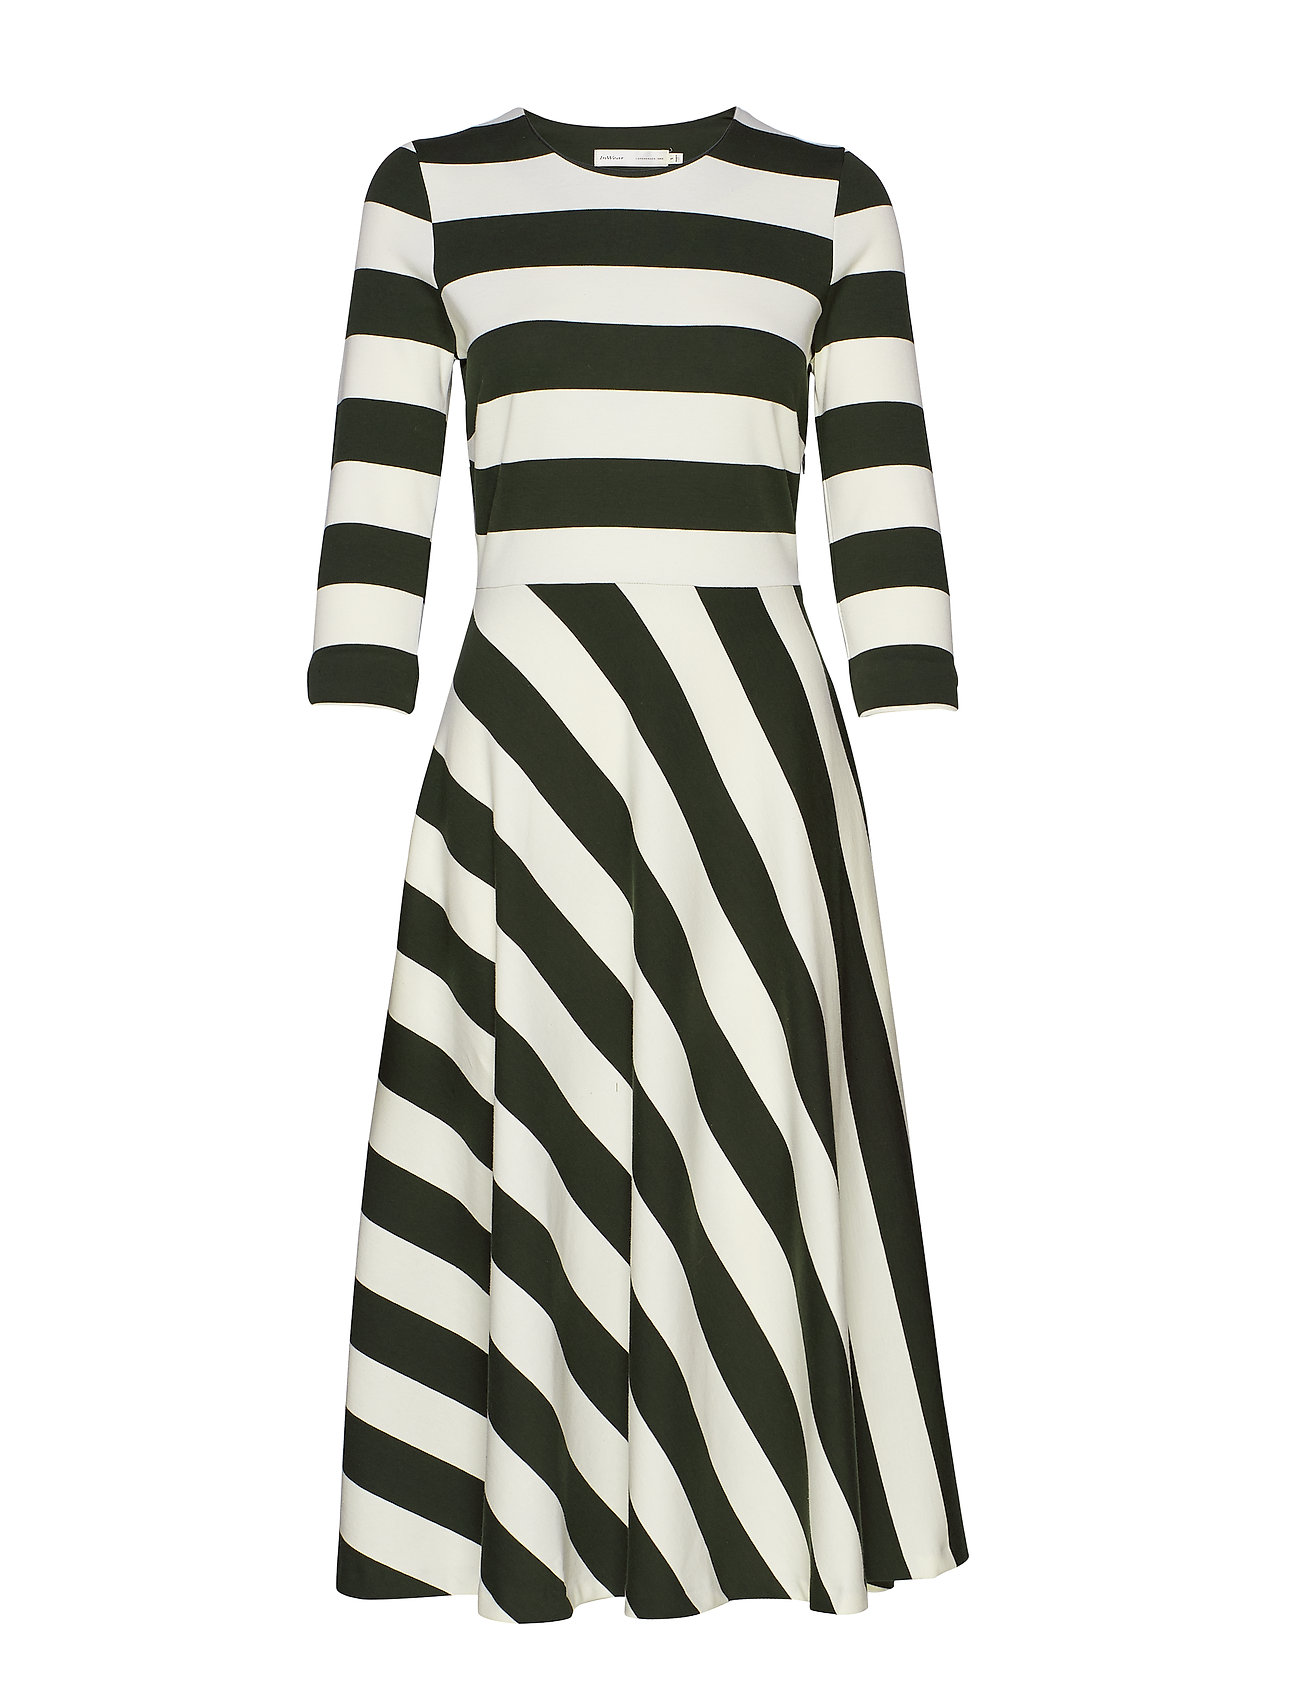 InWear Werone Cirkle Skirt Dress - FRENCH NOUGAT / OLIVE LEAF